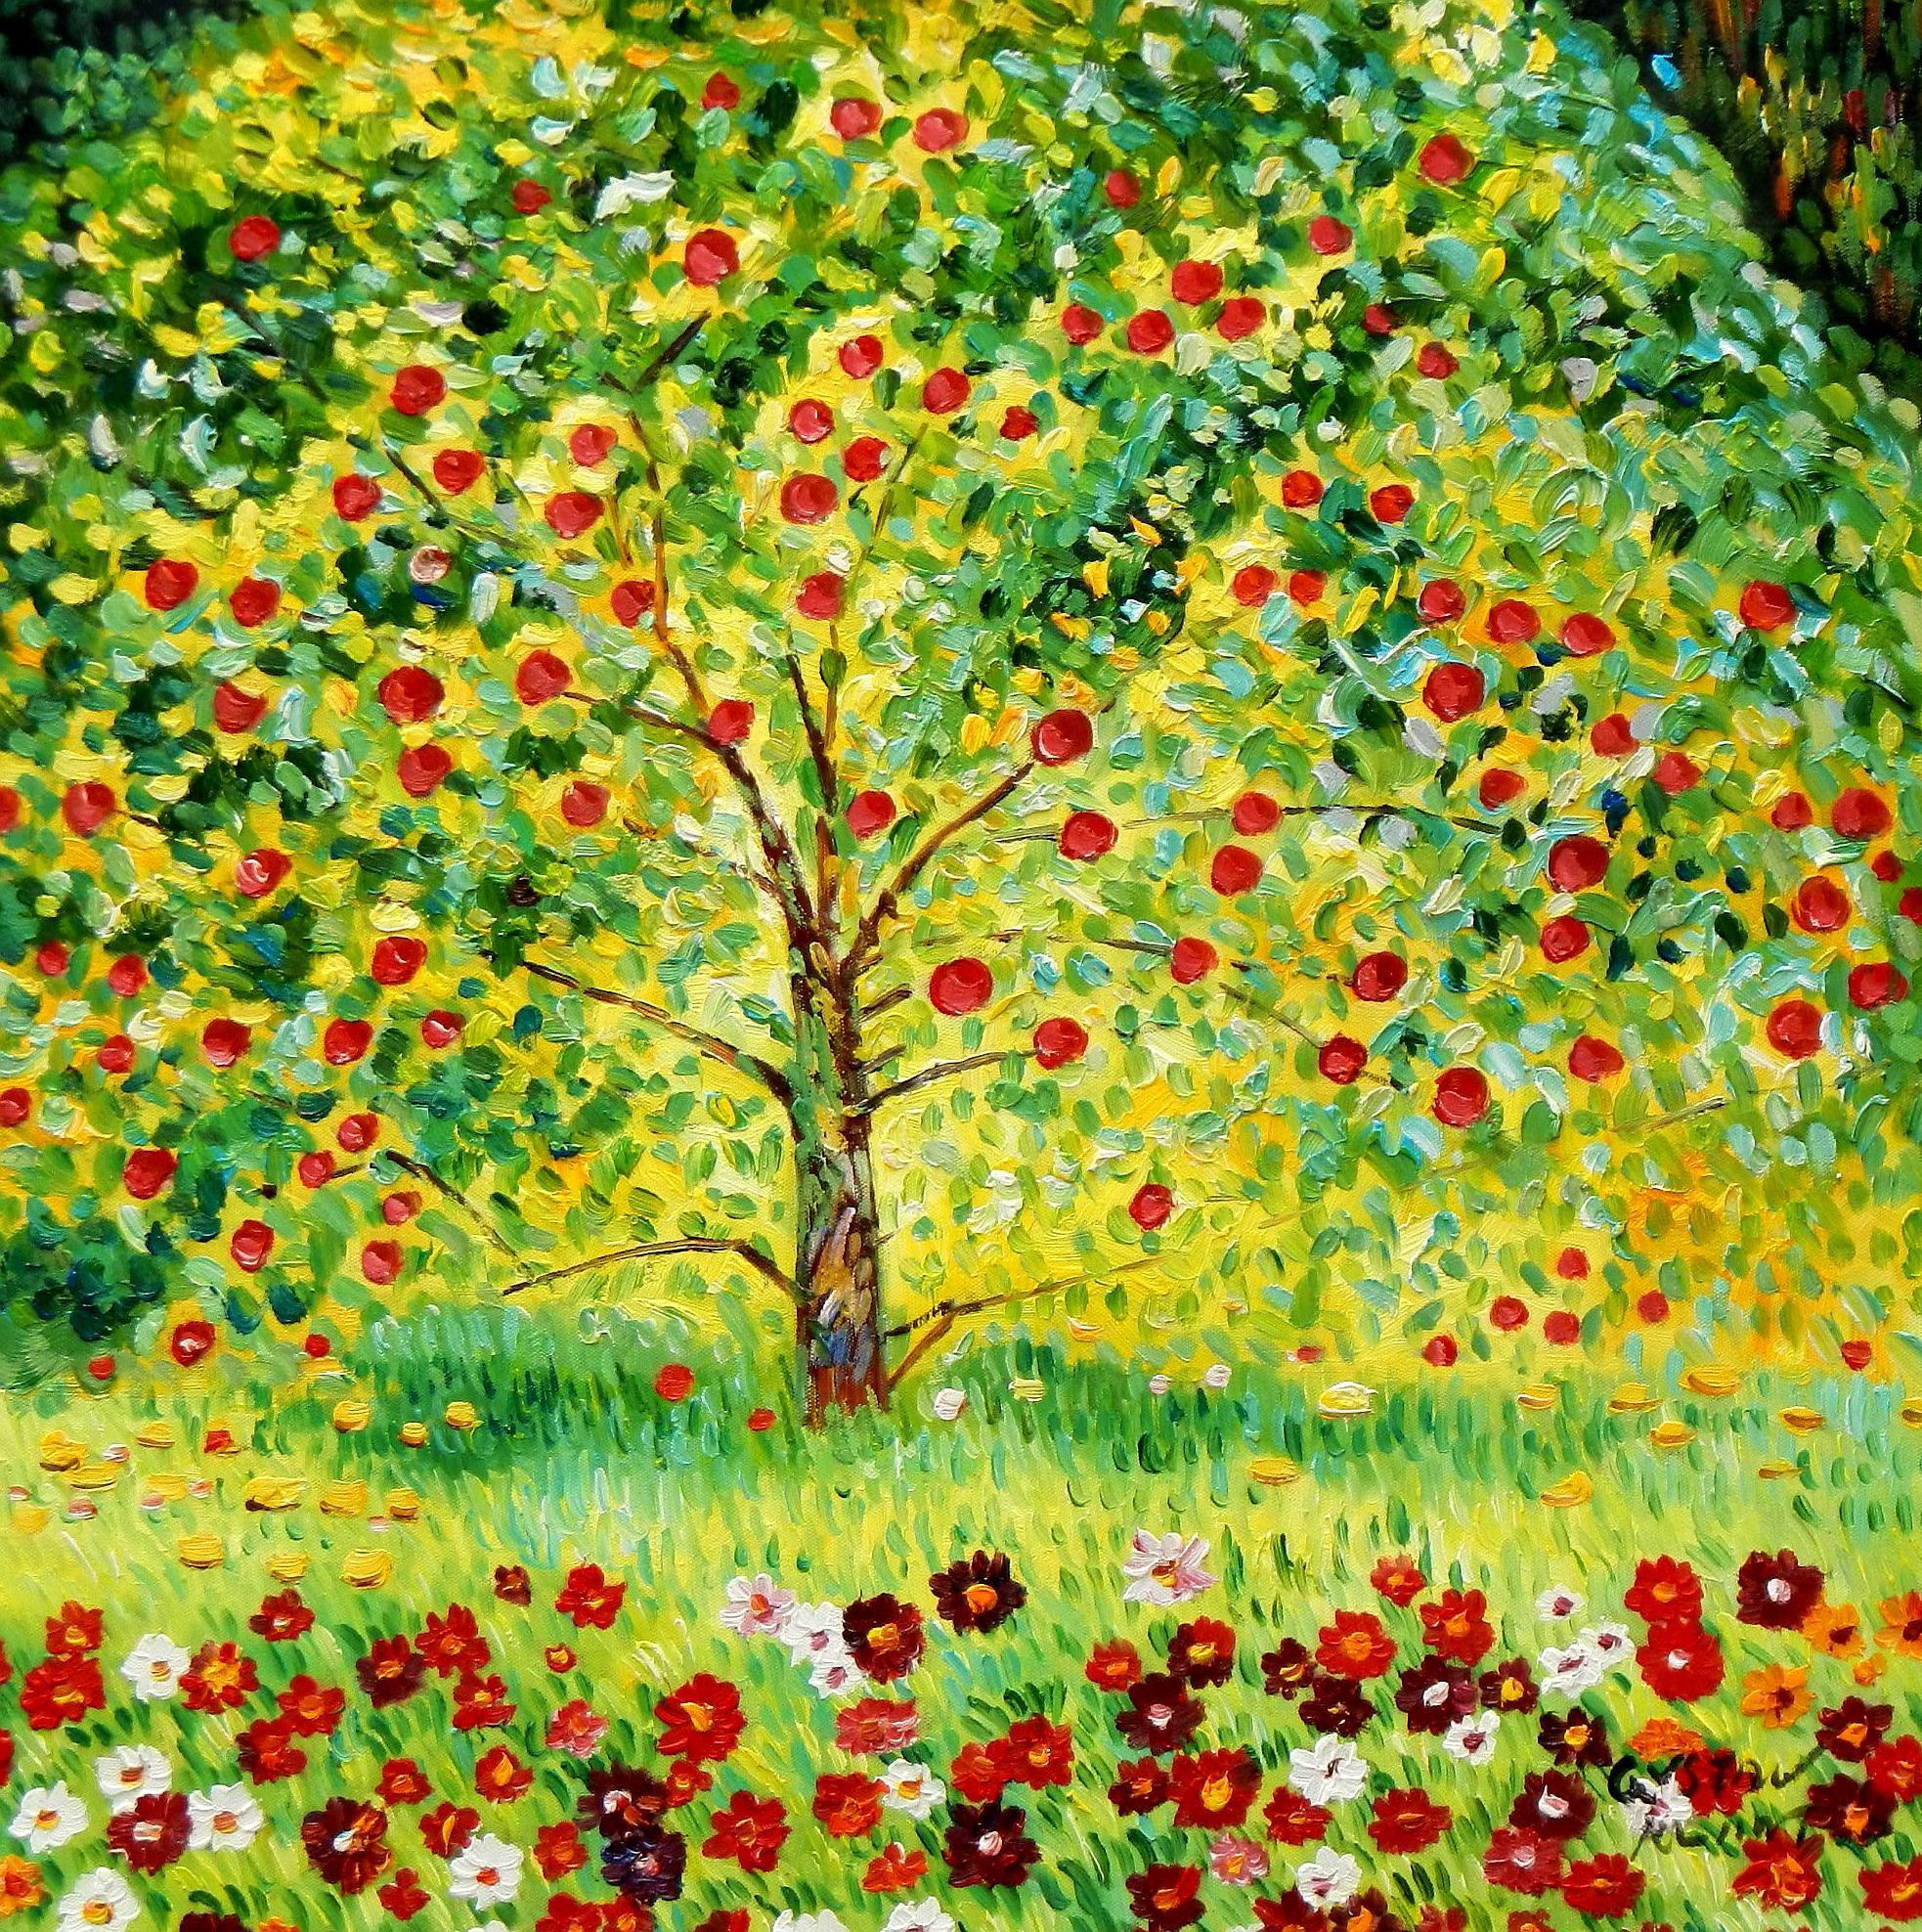 Gustav Klimt - Der Apfelbaum e92025 60x60cm bemerkenswertes Ölgemälde handgemalt